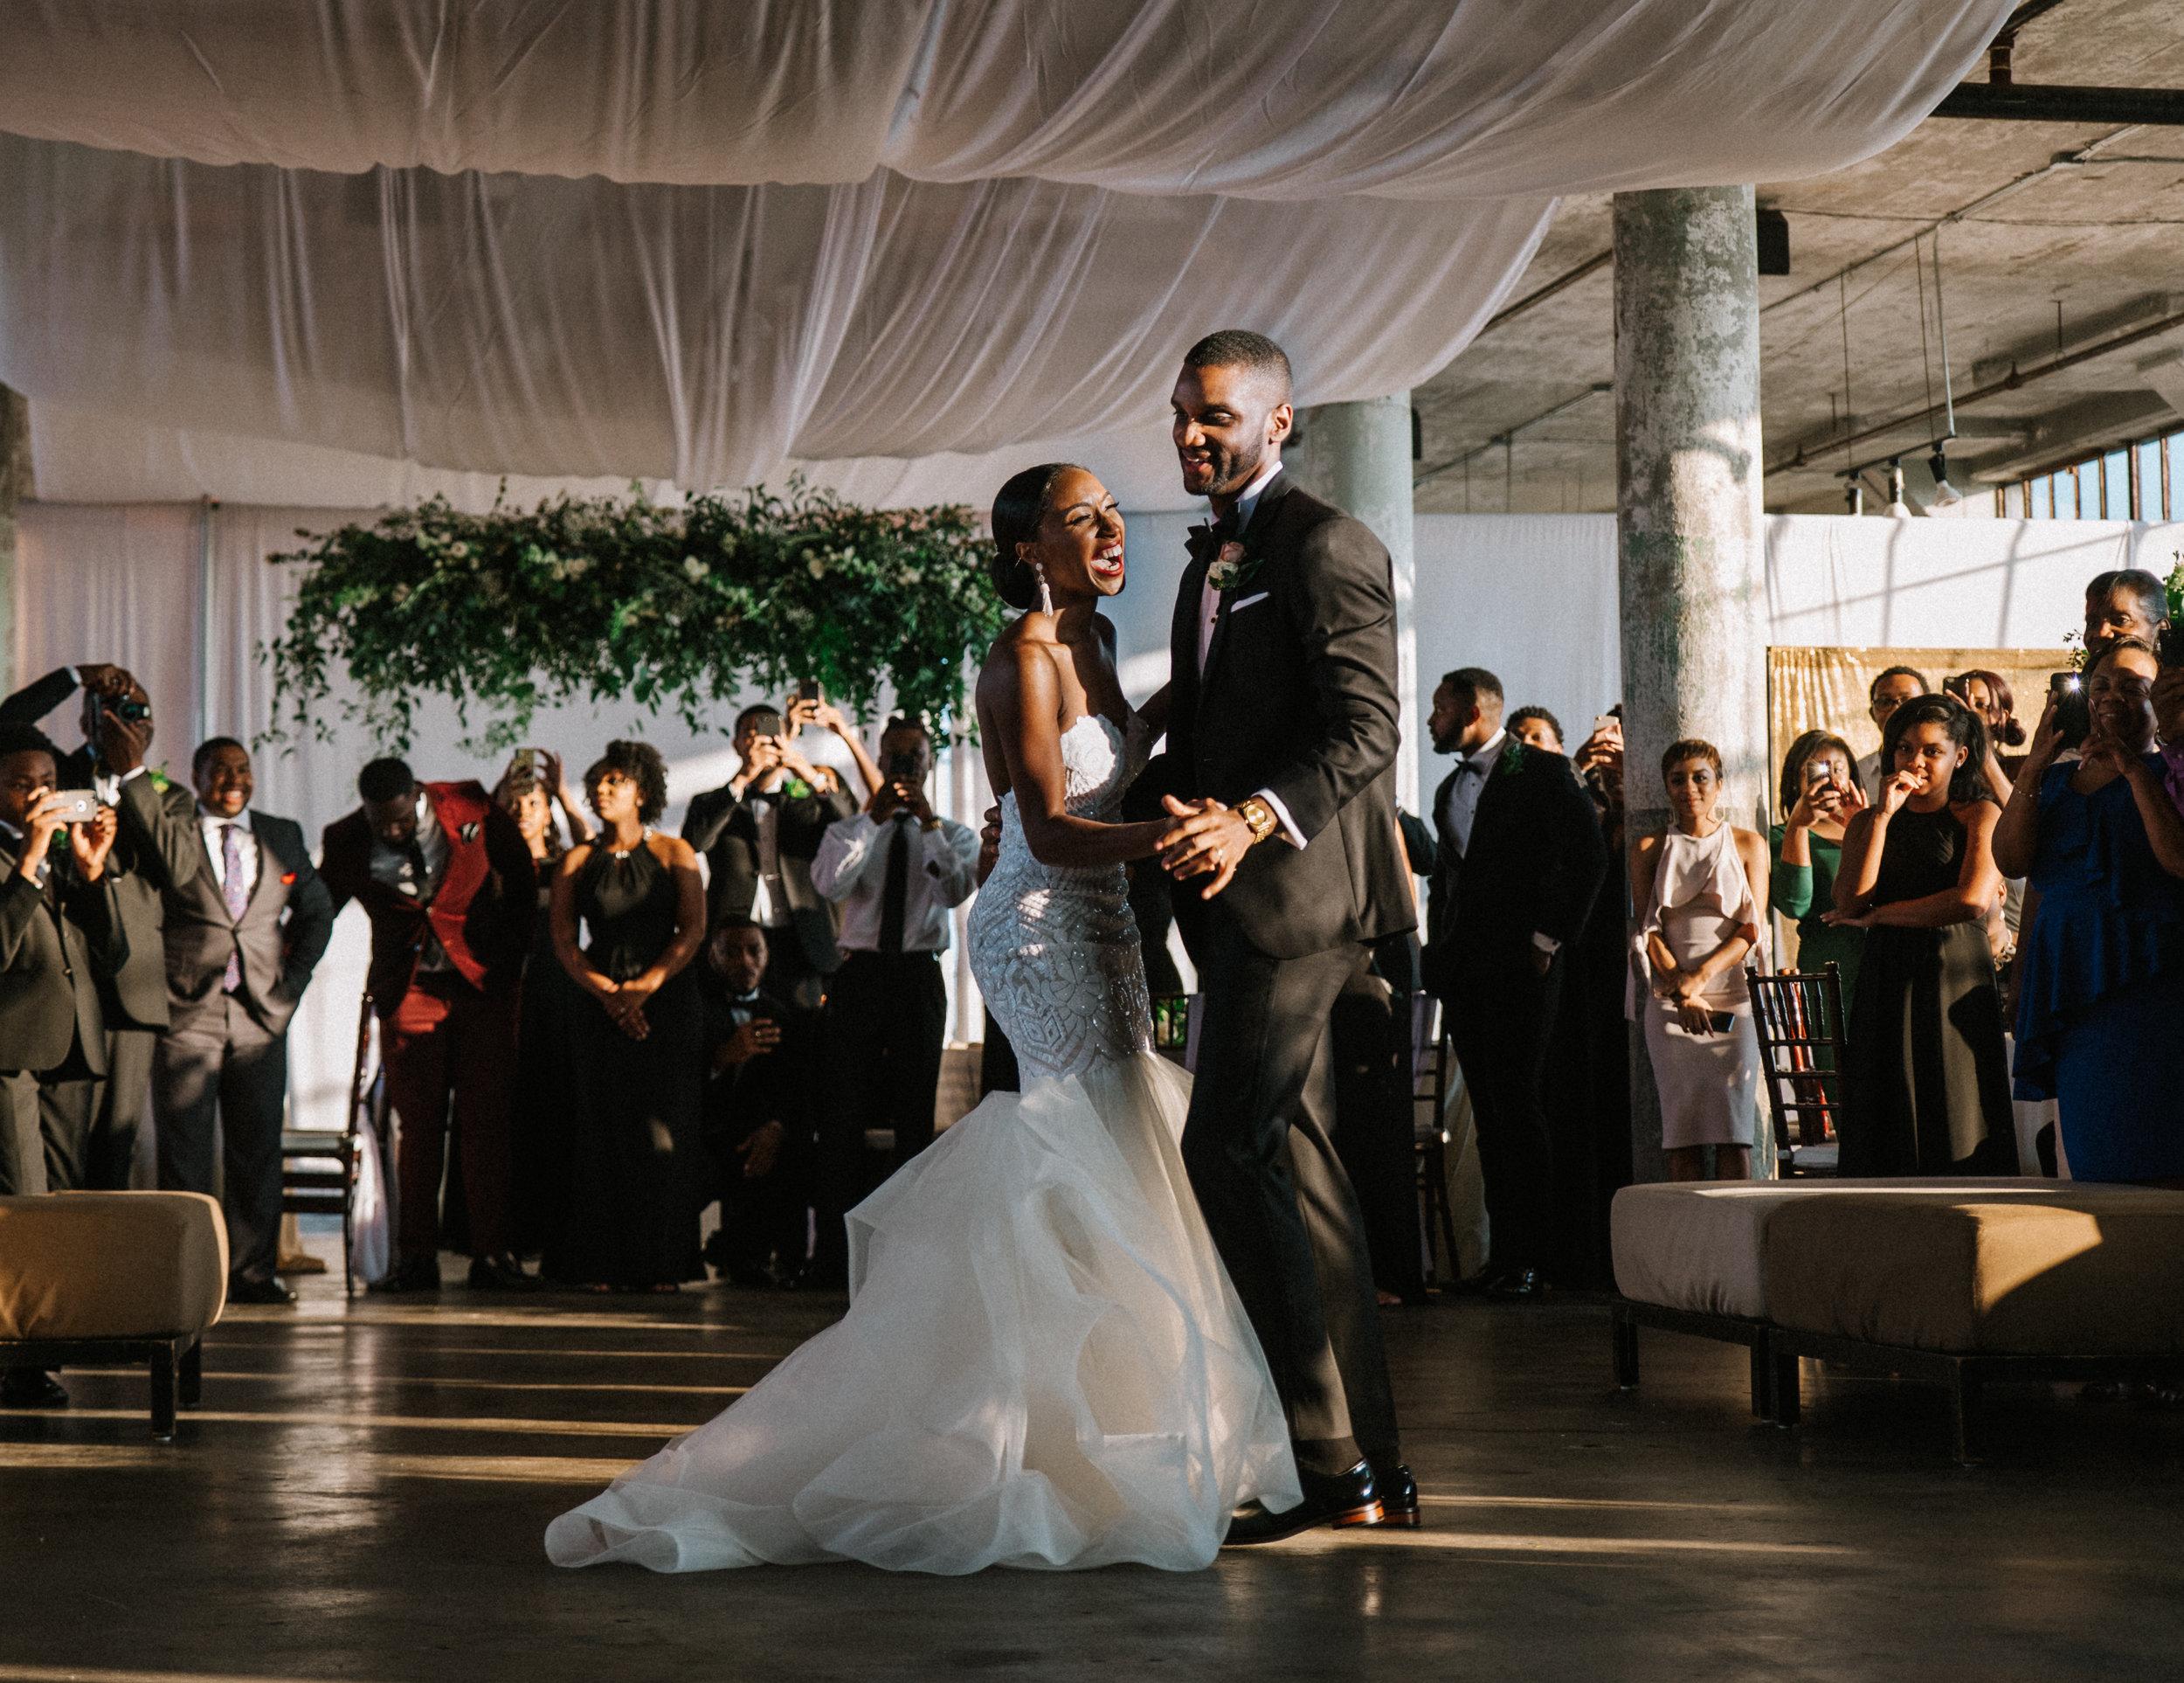 The Lofts at Union Square, High Point, NC. Wedding Reception Photos, First Dance Photos. North Carolina Wedding Photographer, Marina Rey Photography.